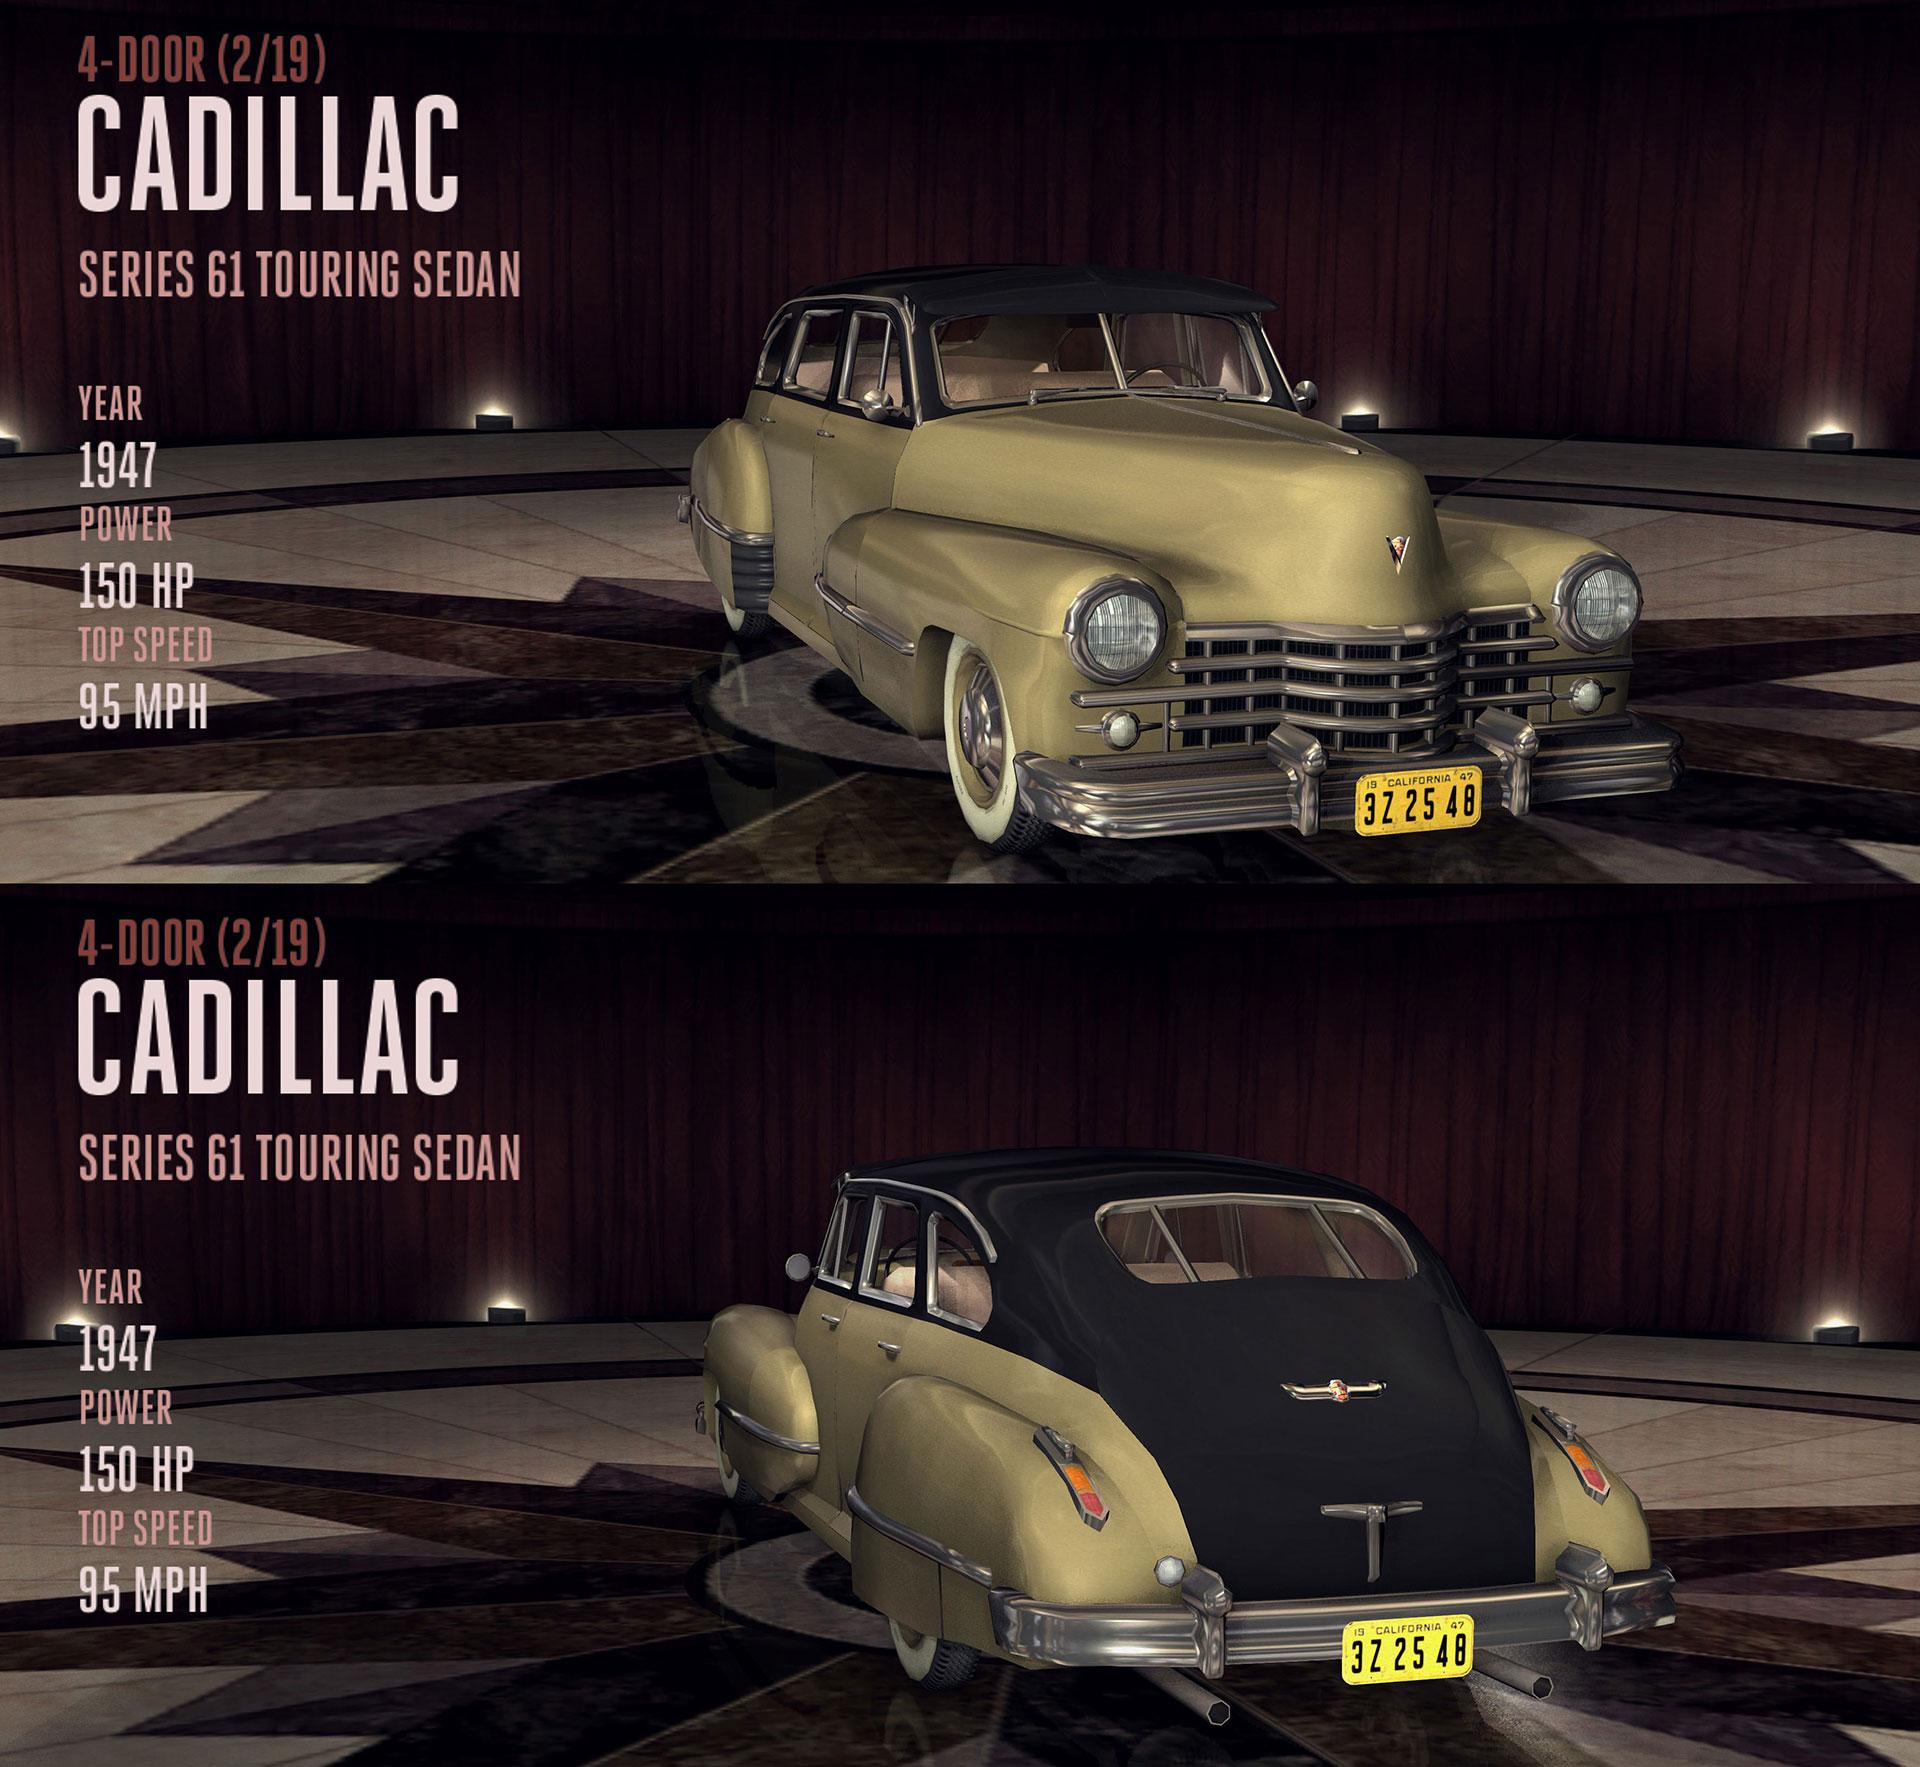 File:1947-cadillac-series-61-touring-sedan.jpg